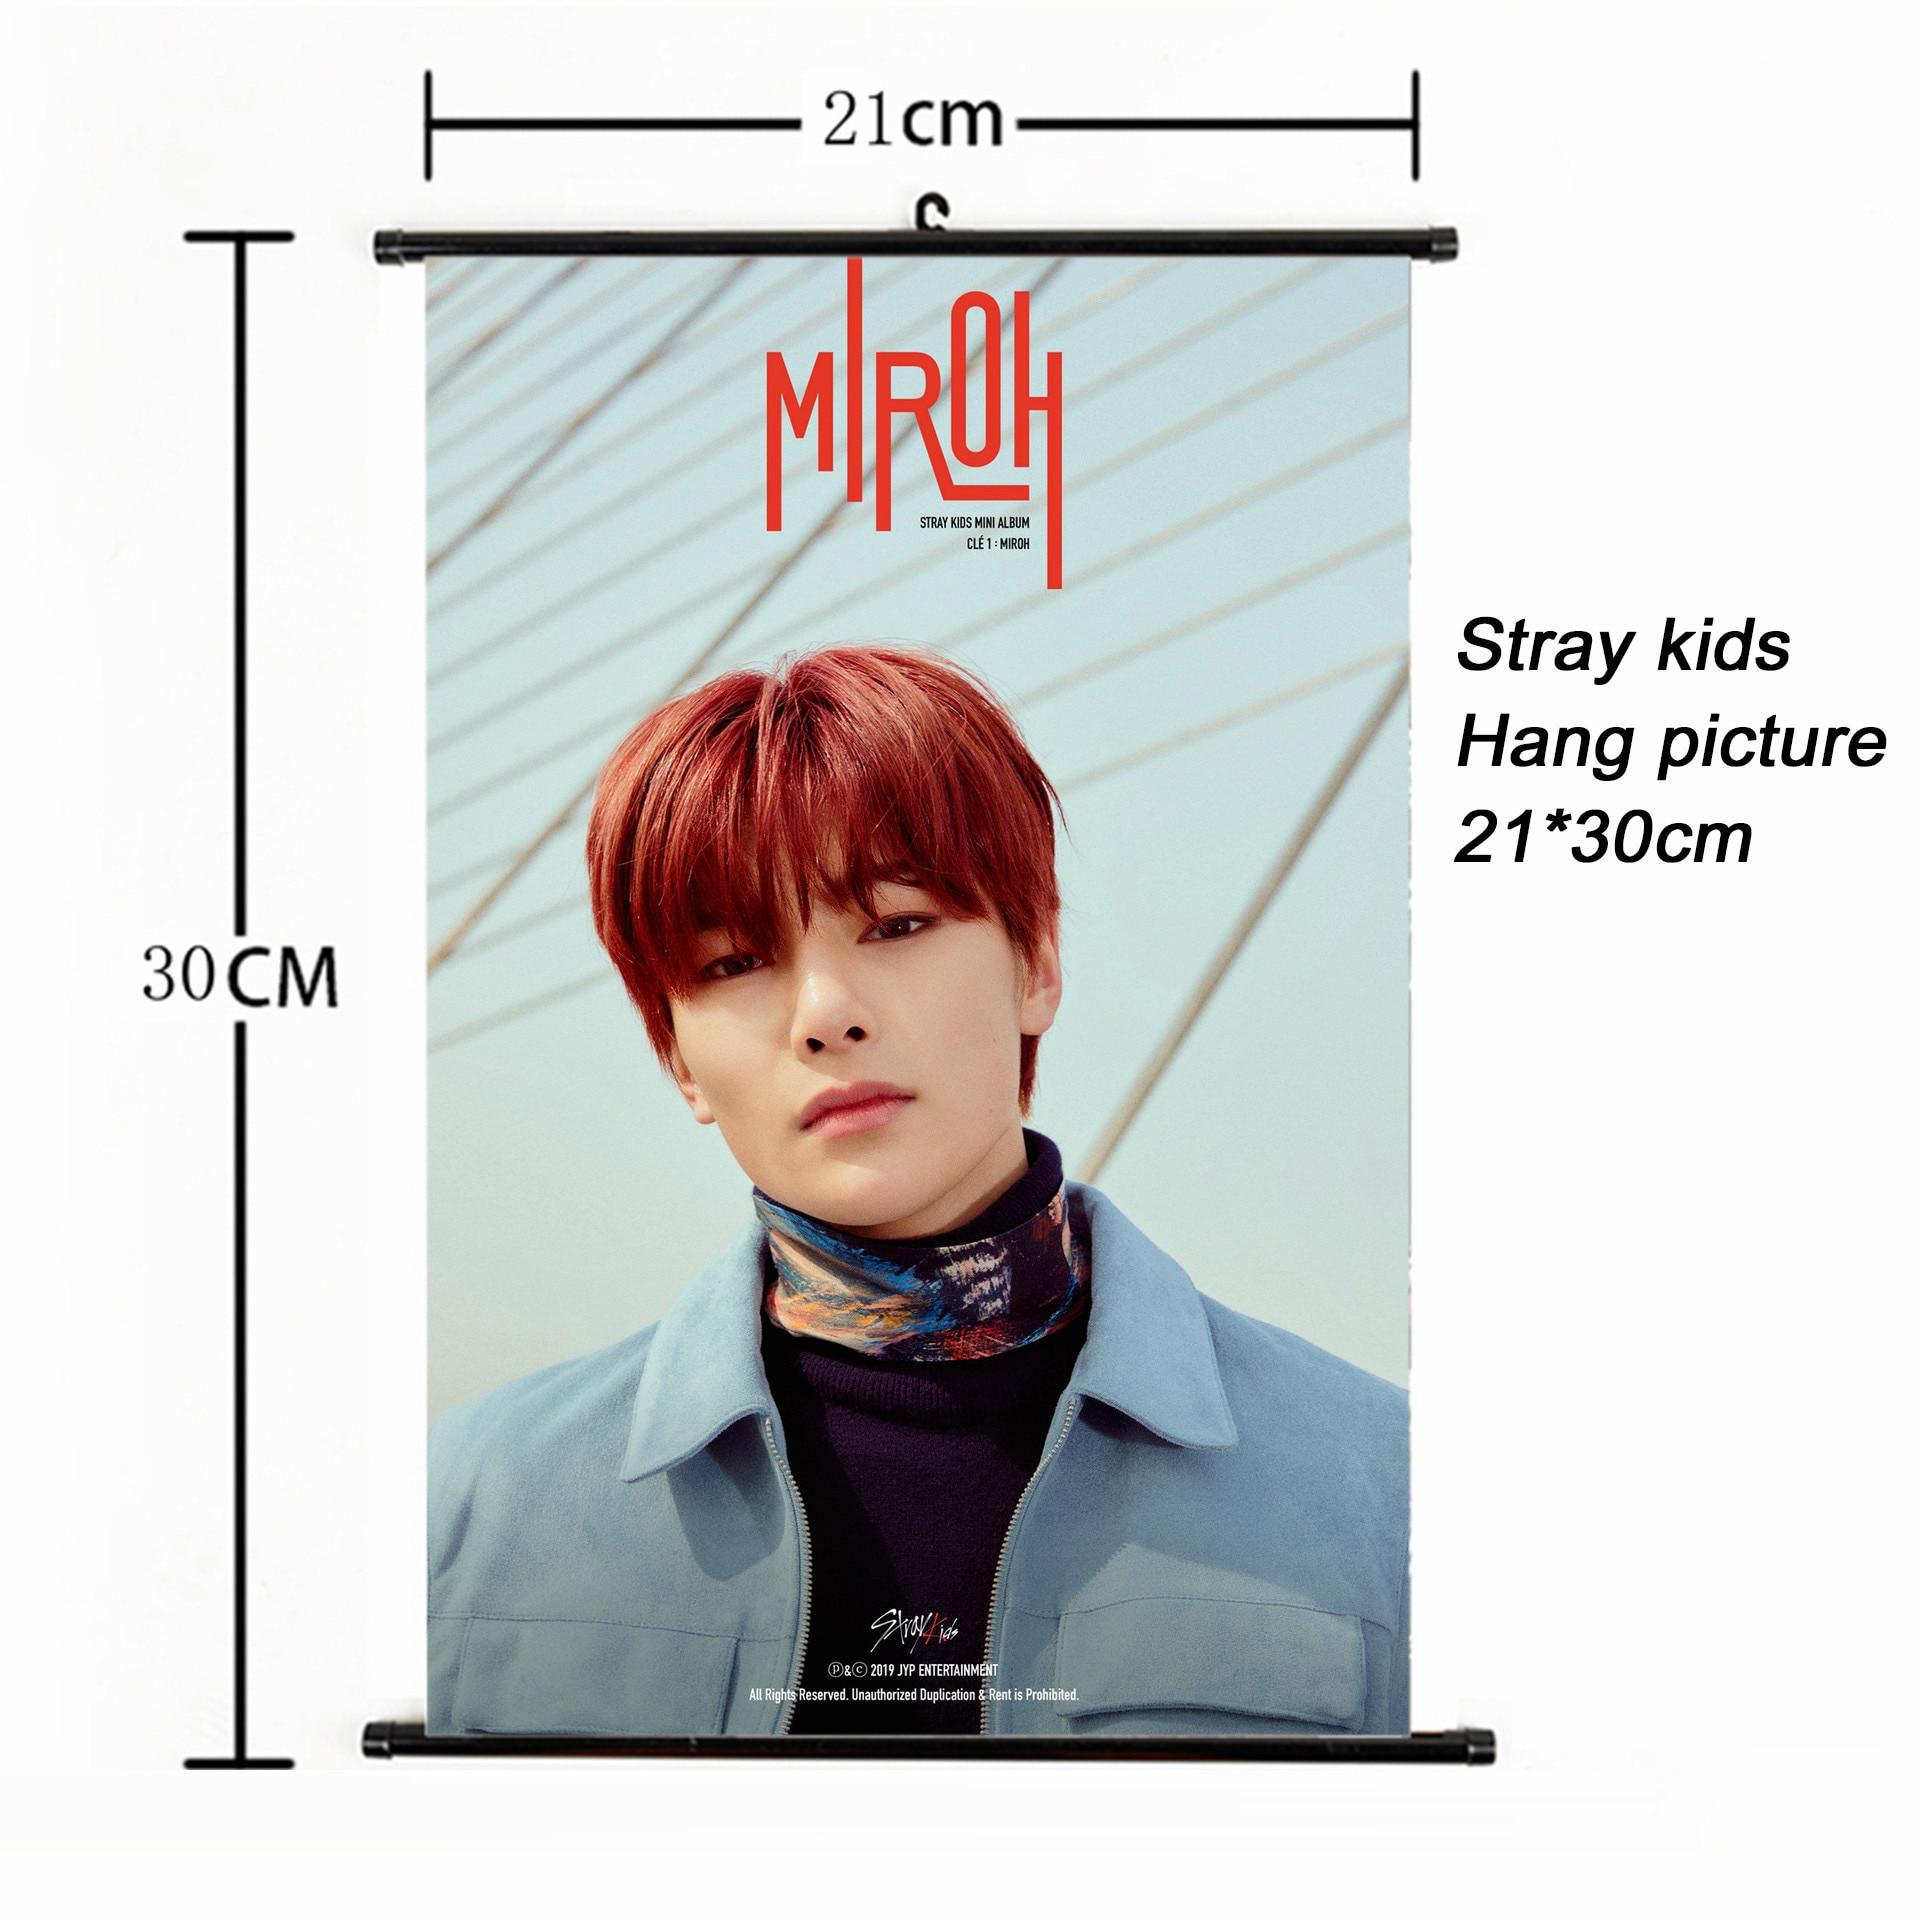 Handsome guy poster Stray Kids album I am YOU, I am WHO